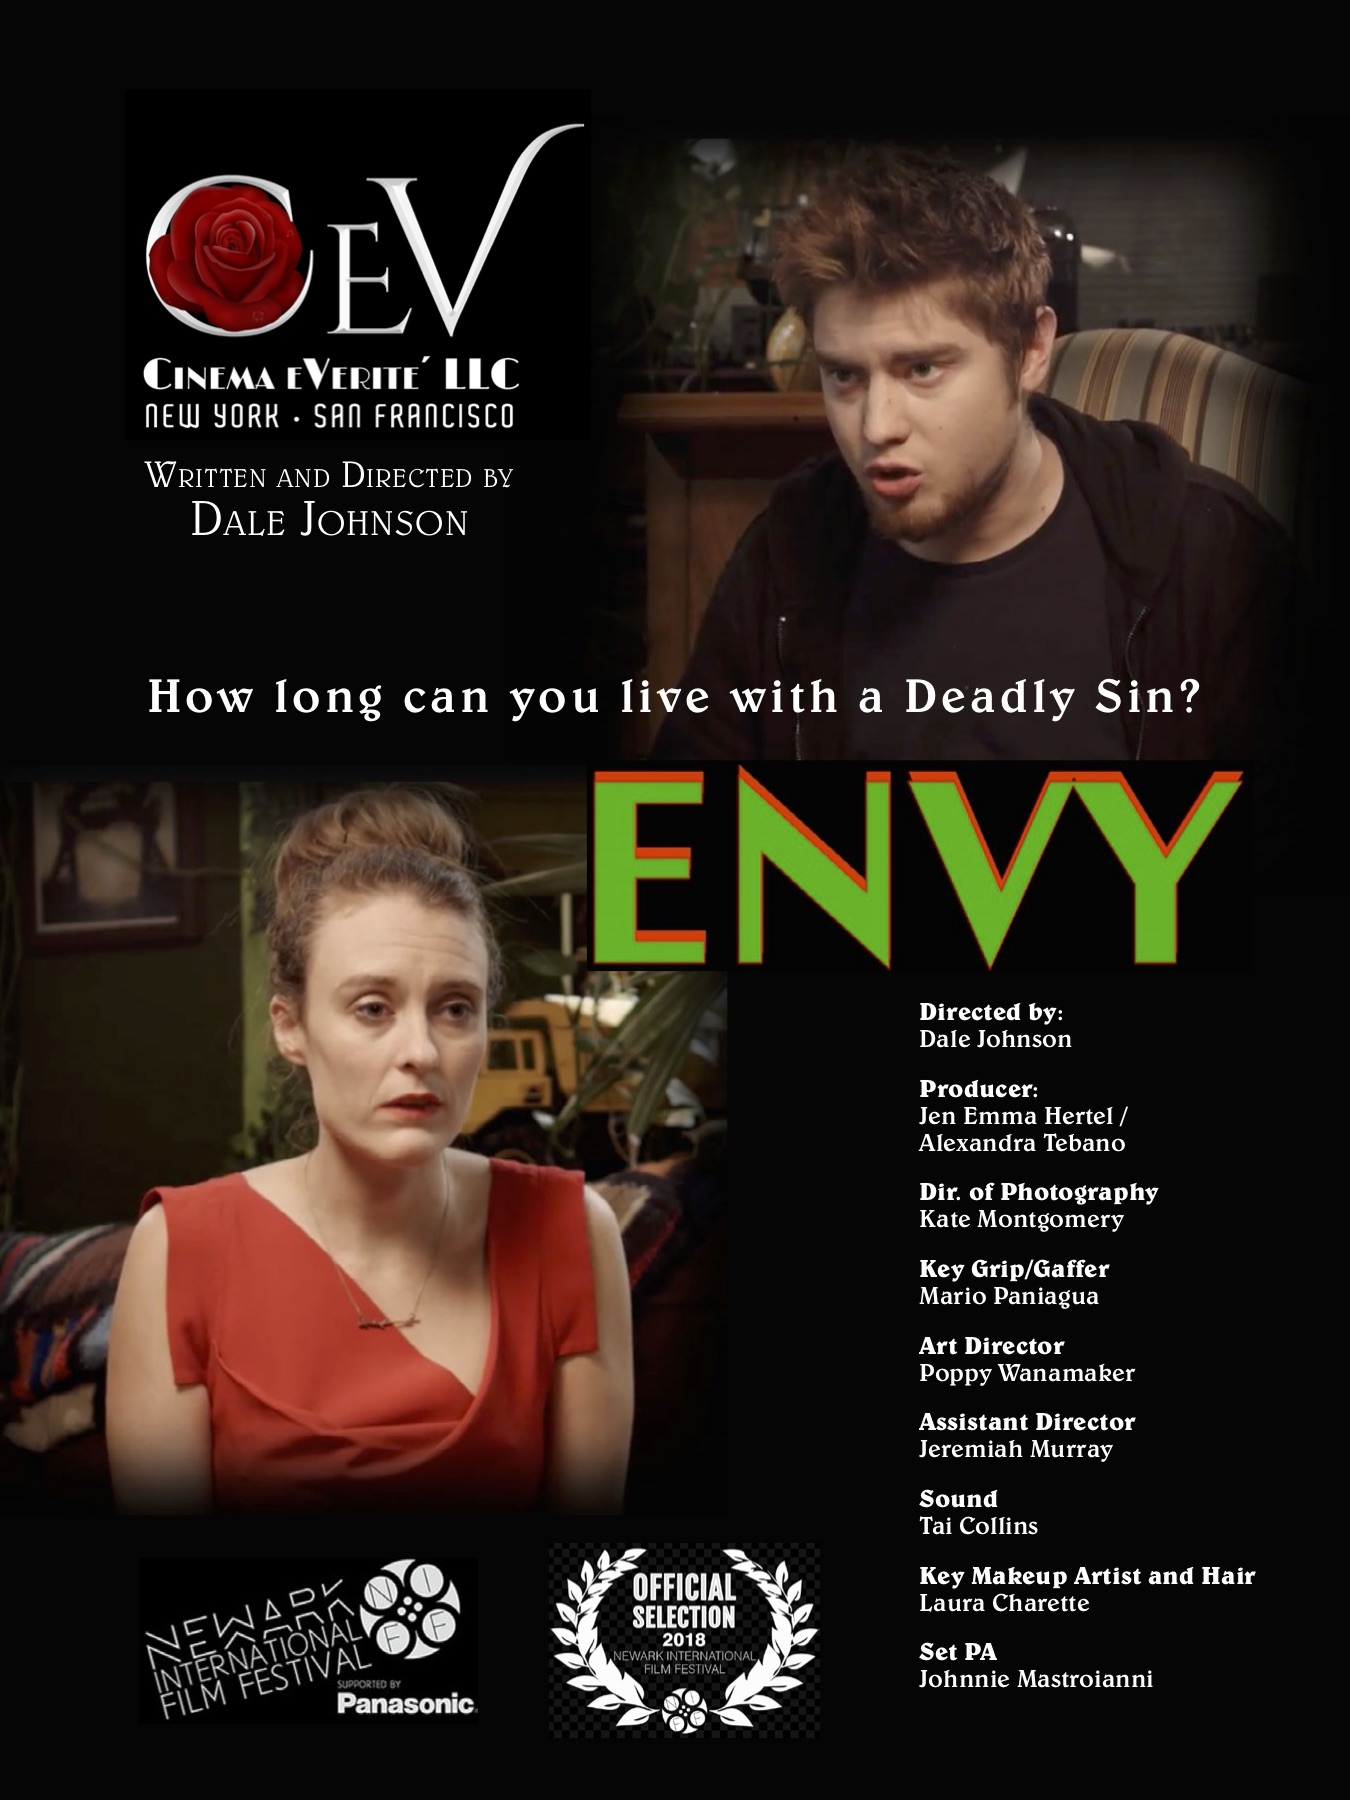 CeV-2018NewarkIFF-ShortFilm-ENVY-POSTER.jpg